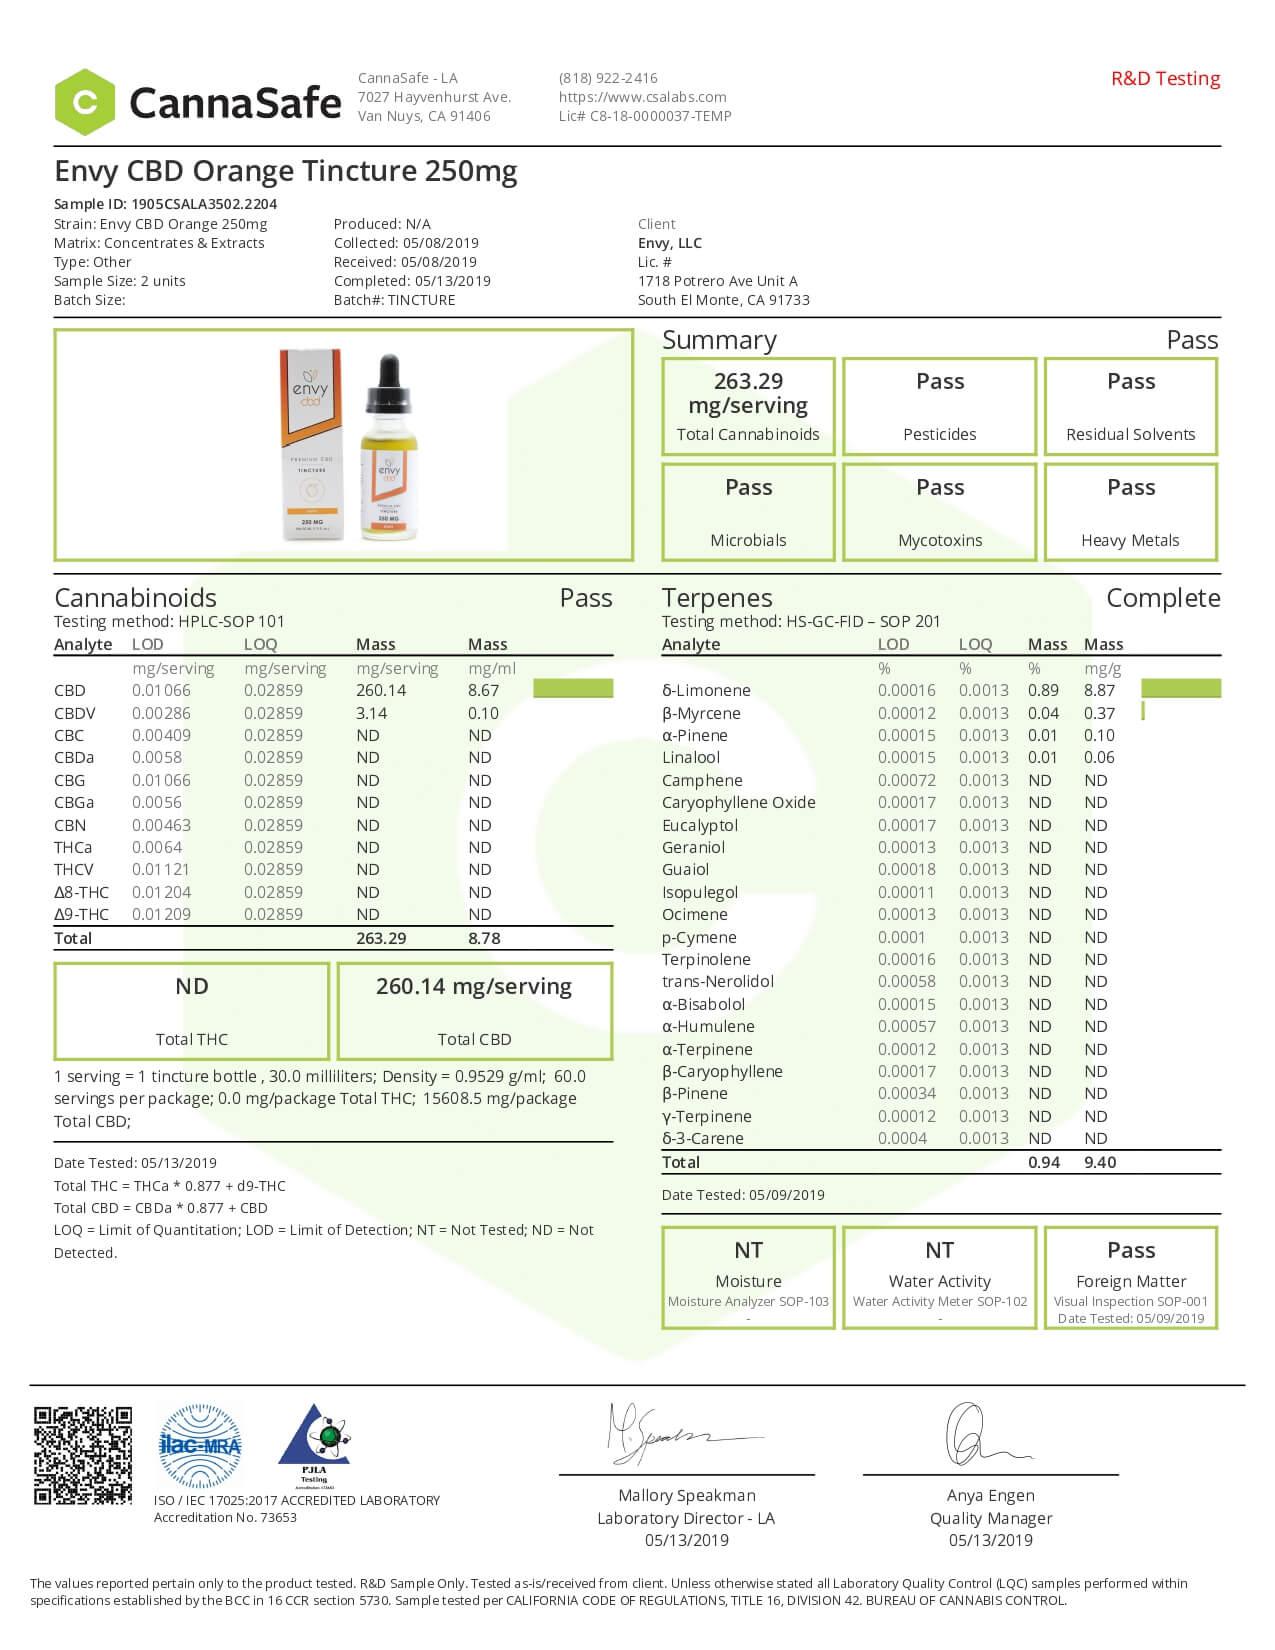 ENVY CBD Tincture Orange 250mg Lab Report